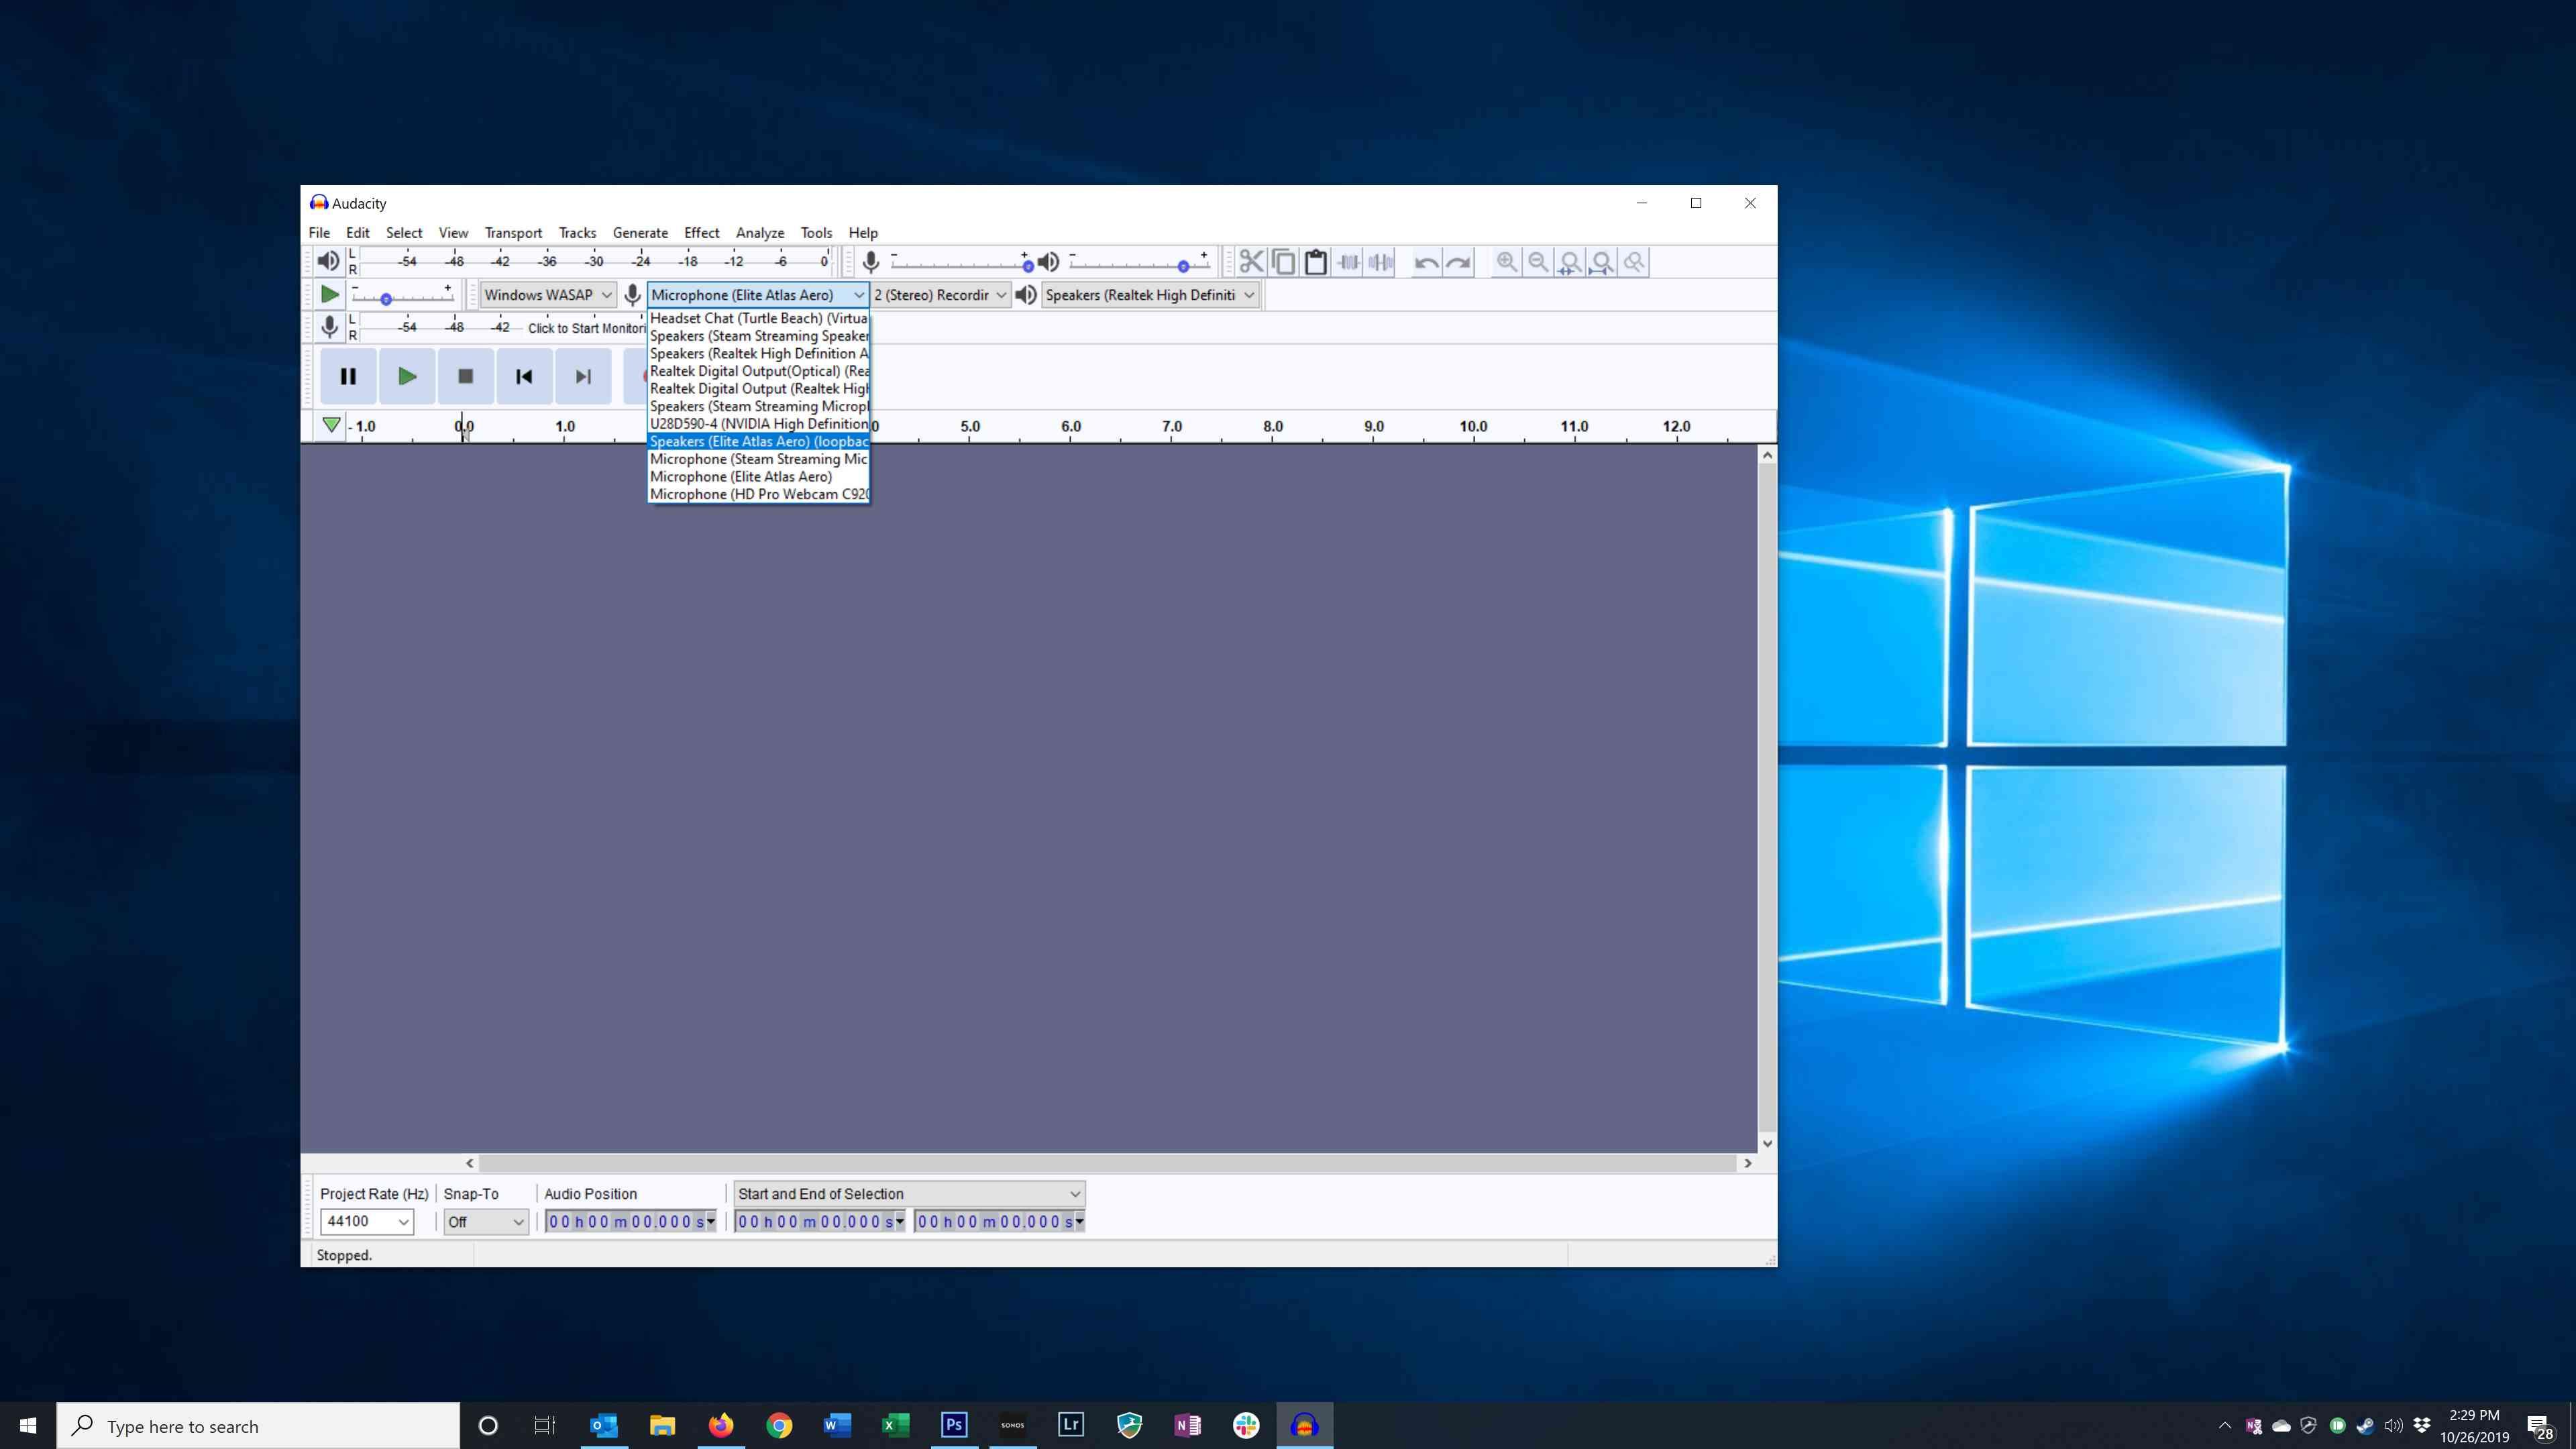 Configuring the audio input in Audacity